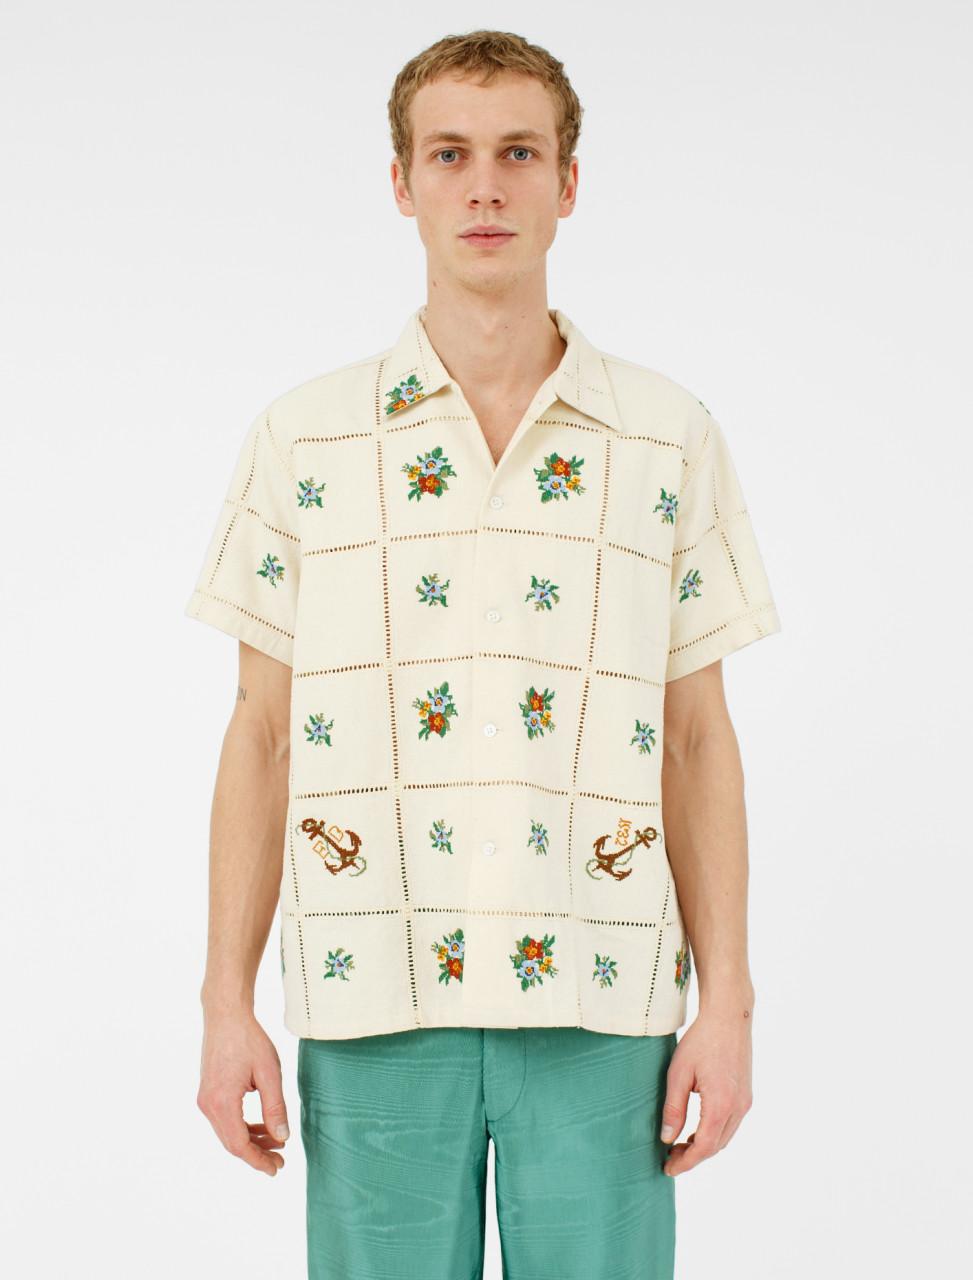 Floral Patch Bowling Shirt